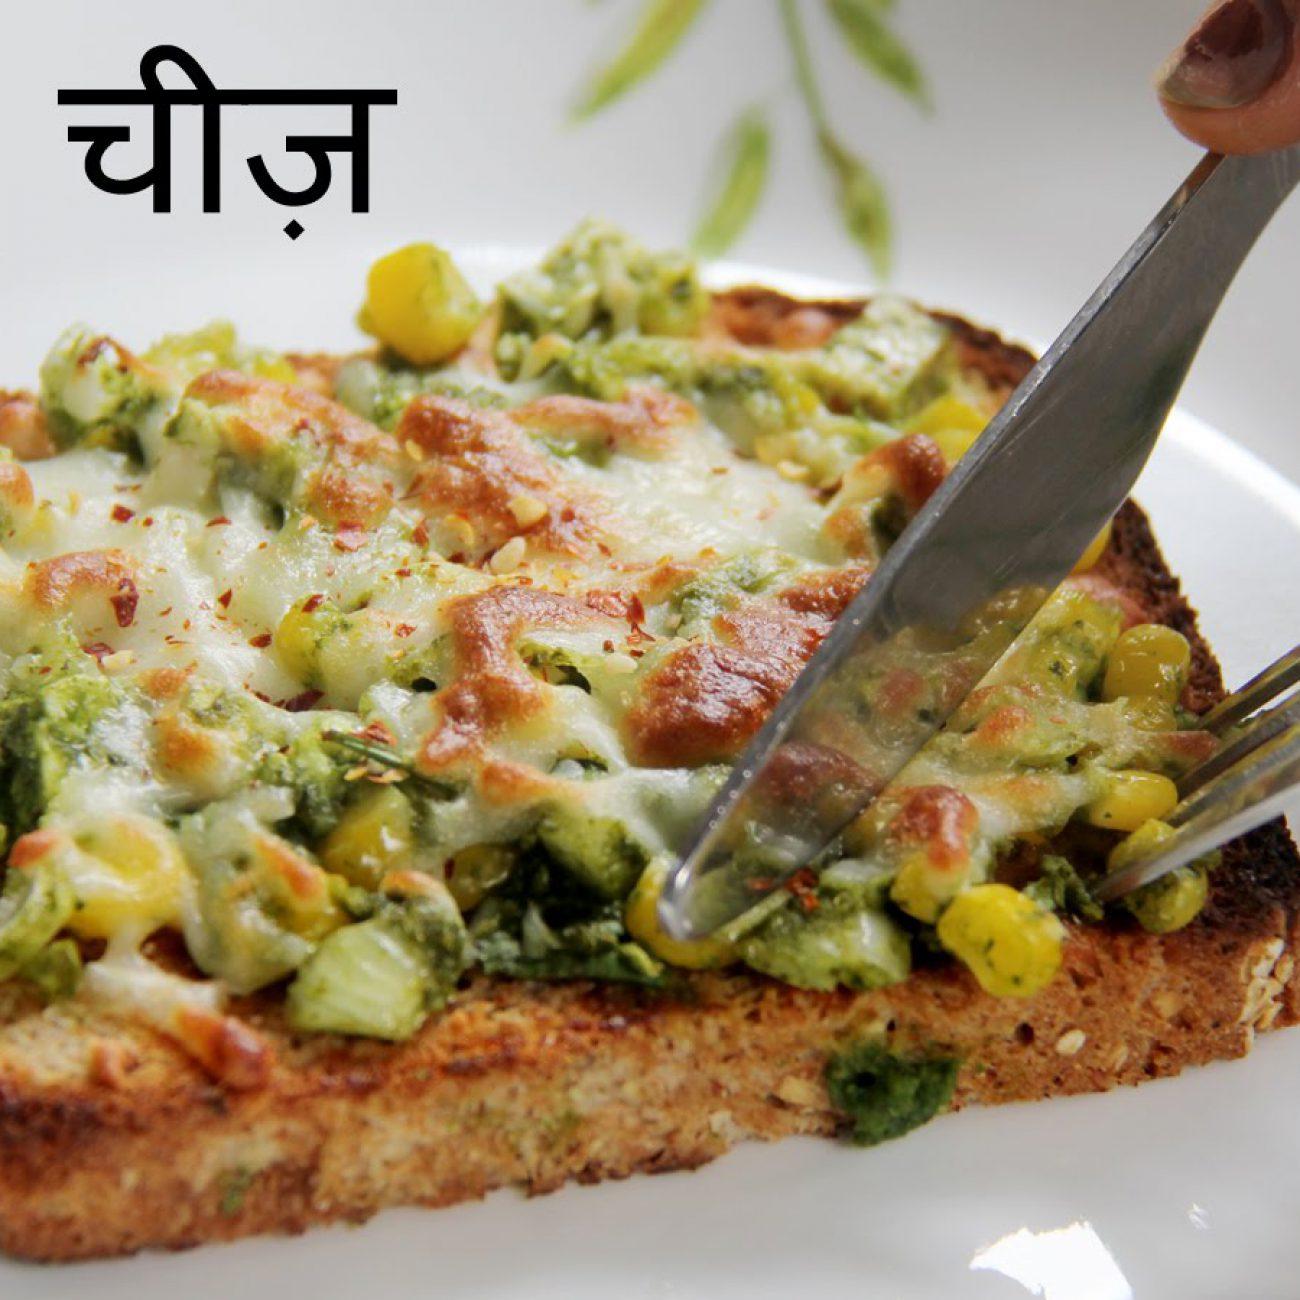 Chutney cheese toast Hindi /चटनी चीज़ टोस्ट/easy breakfast recipe/starter dish ideas for kids